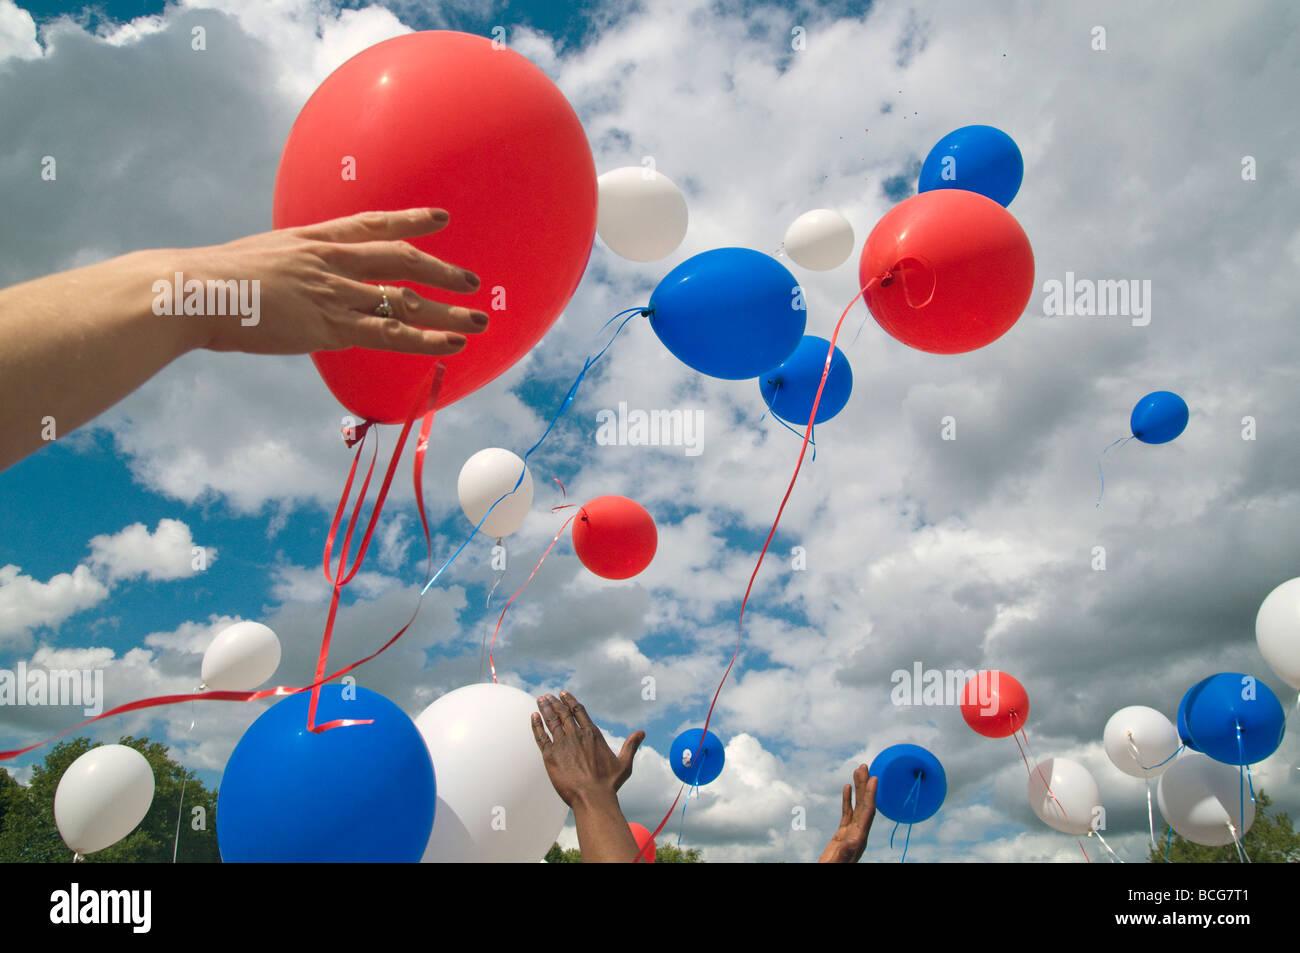 France. Tricolour balloons at Bastille Day festival, Paris.Photo © Julio Etchart - Stock Image